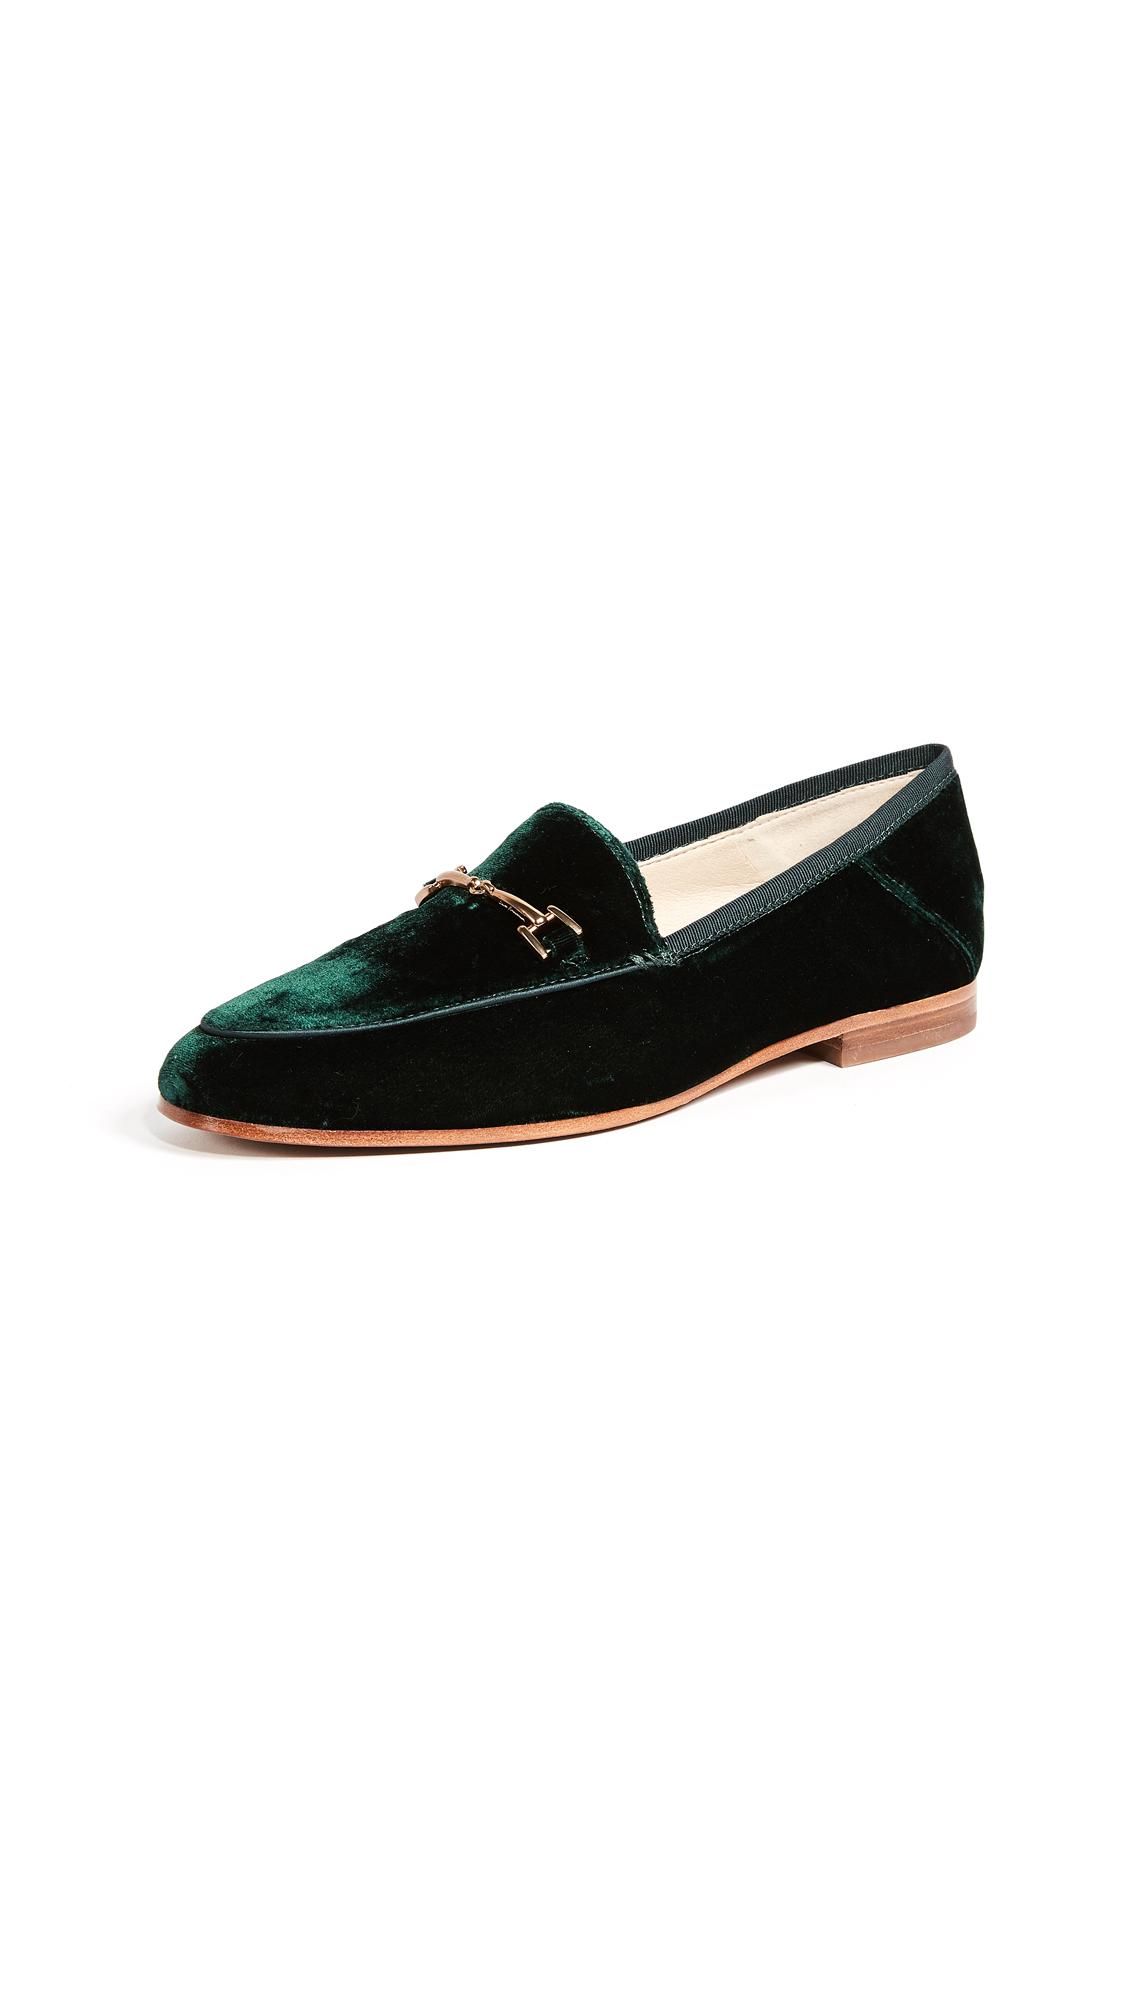 Sam Edelman Loraine Loafers - Emerald Green